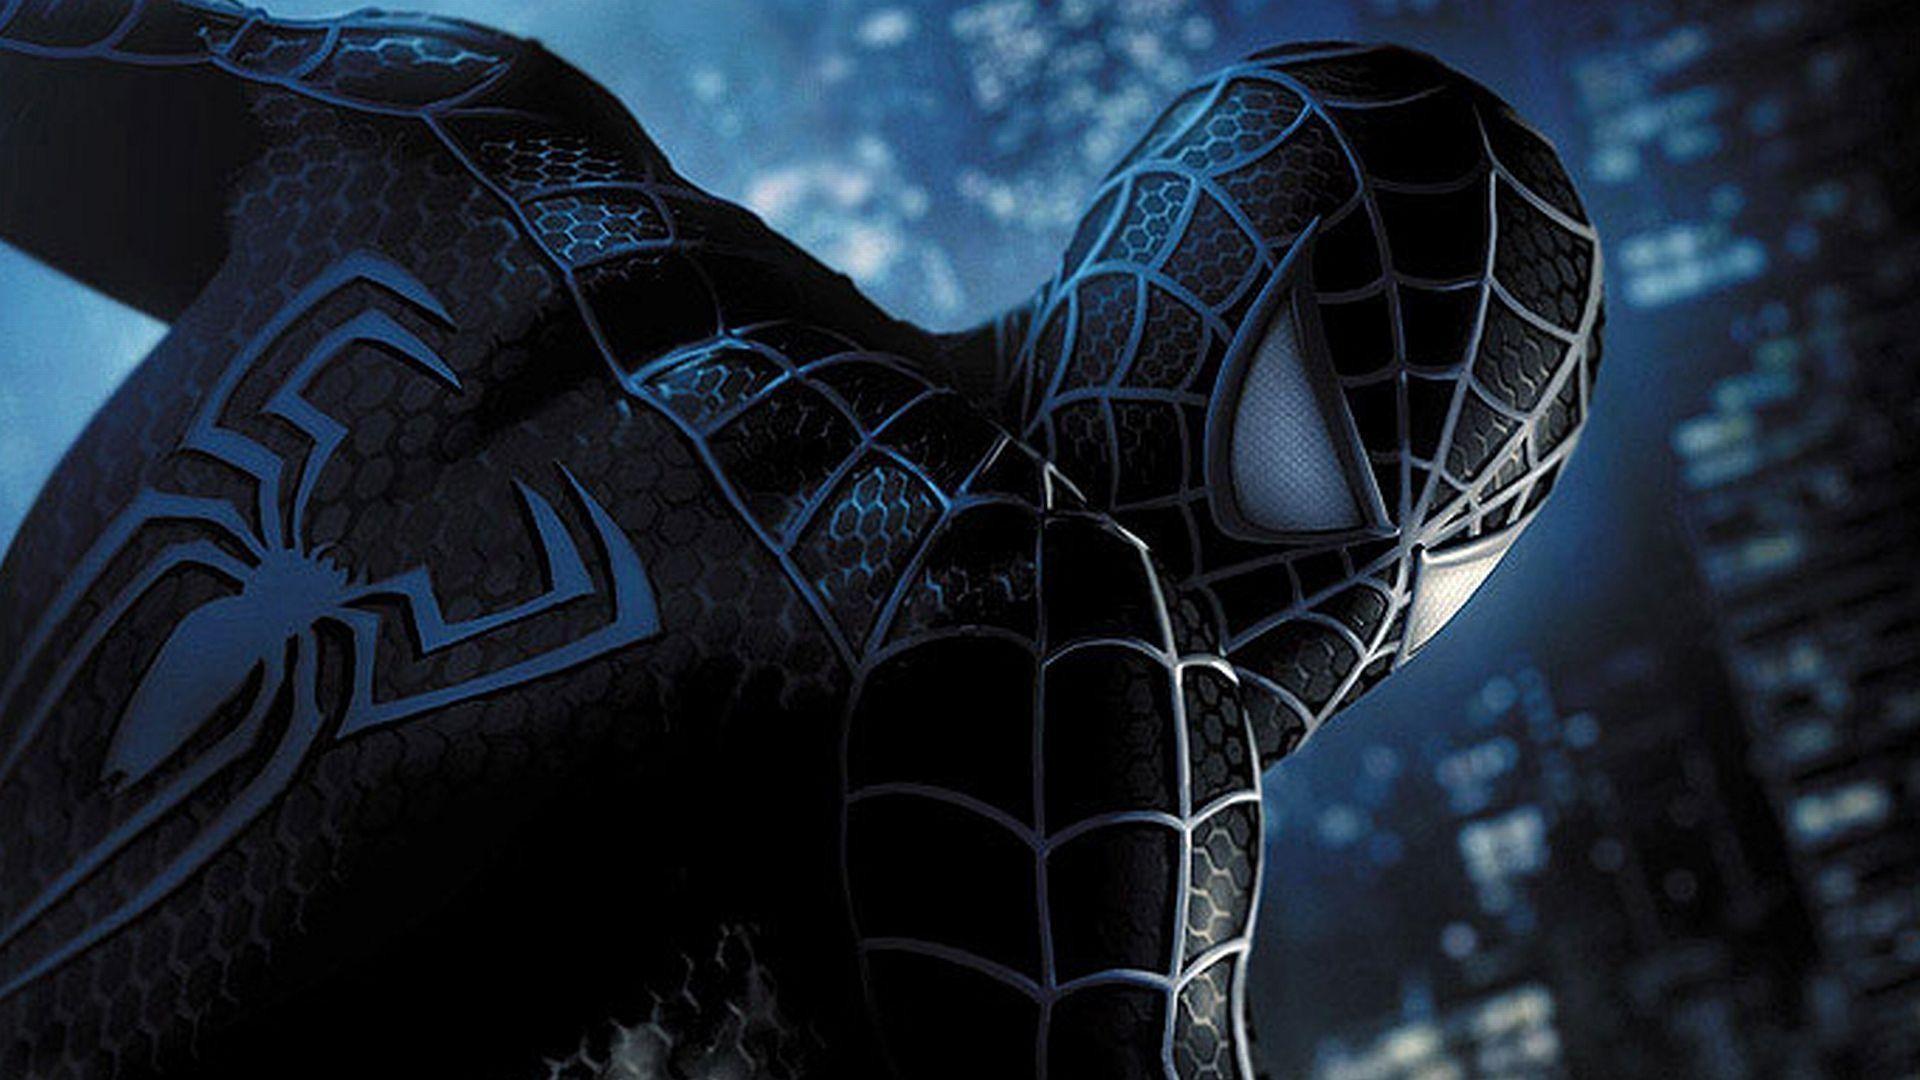 1920x1080 Animals For Black Spiderman Wallpaper Widescreen Hd